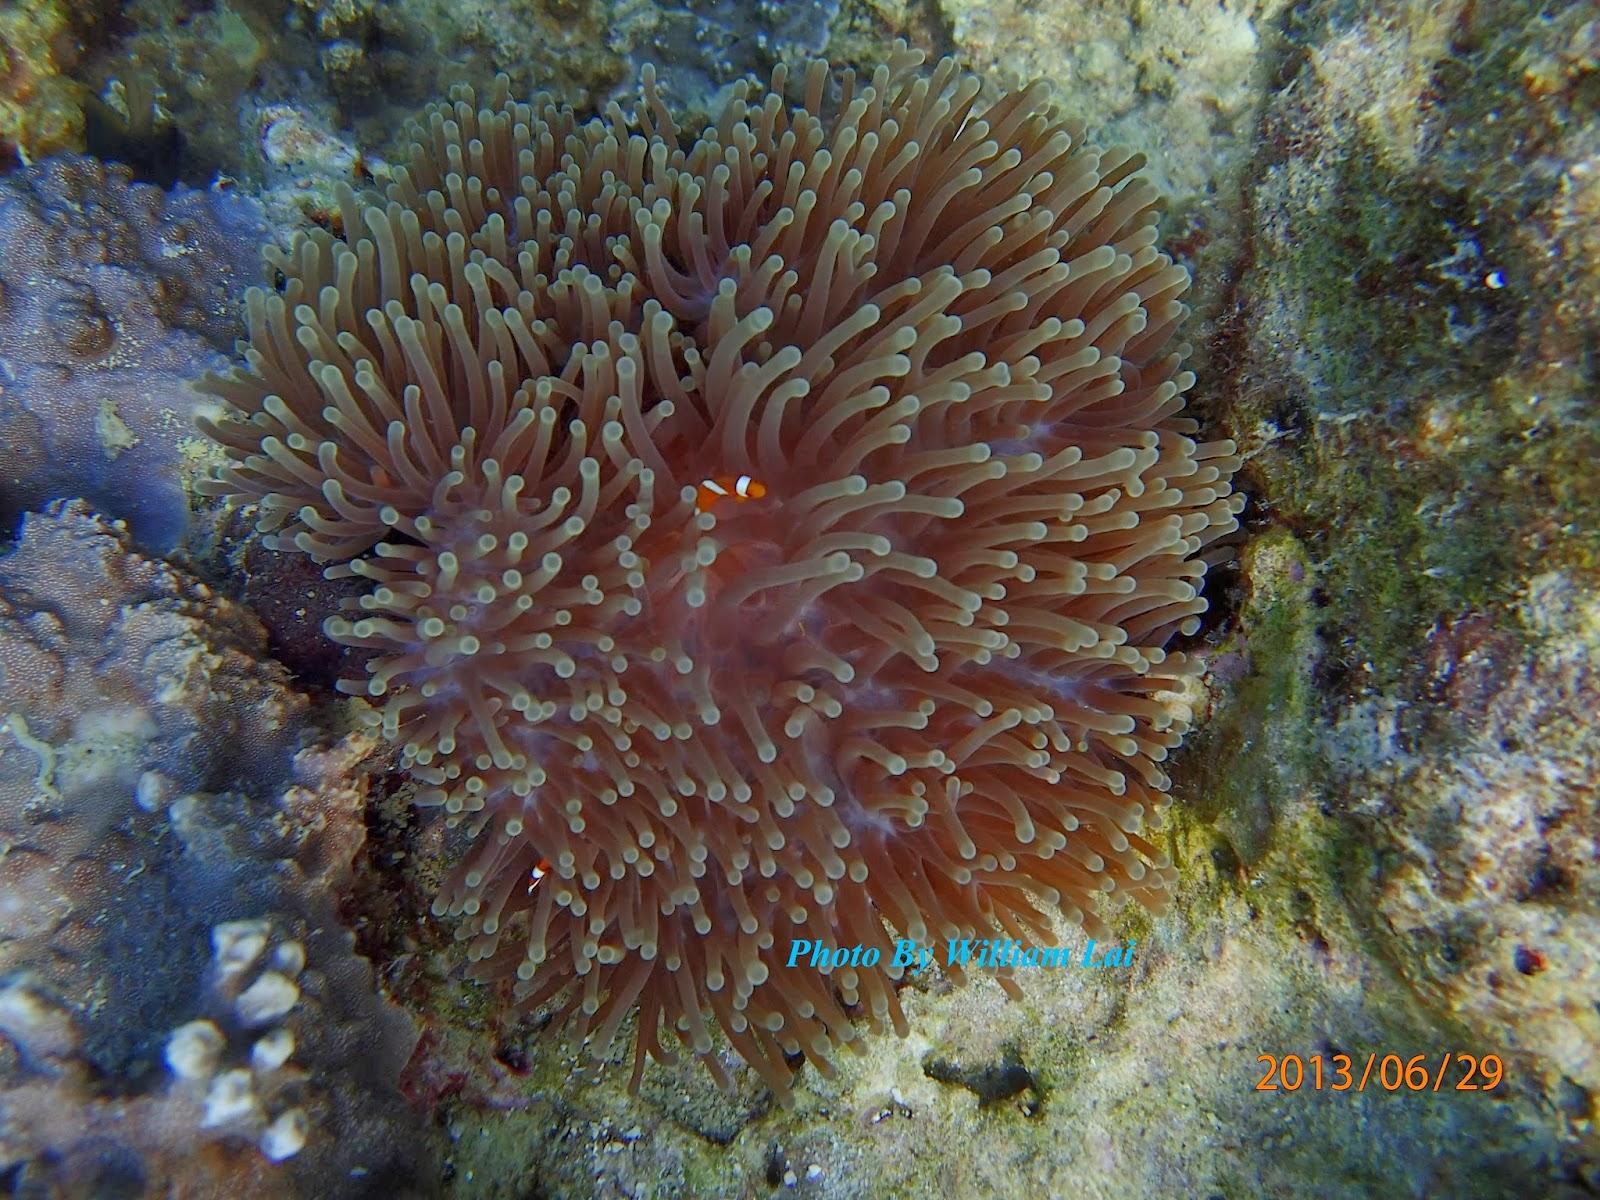 william island paradise ent   beautiful coral  u0026 fish  picture  2